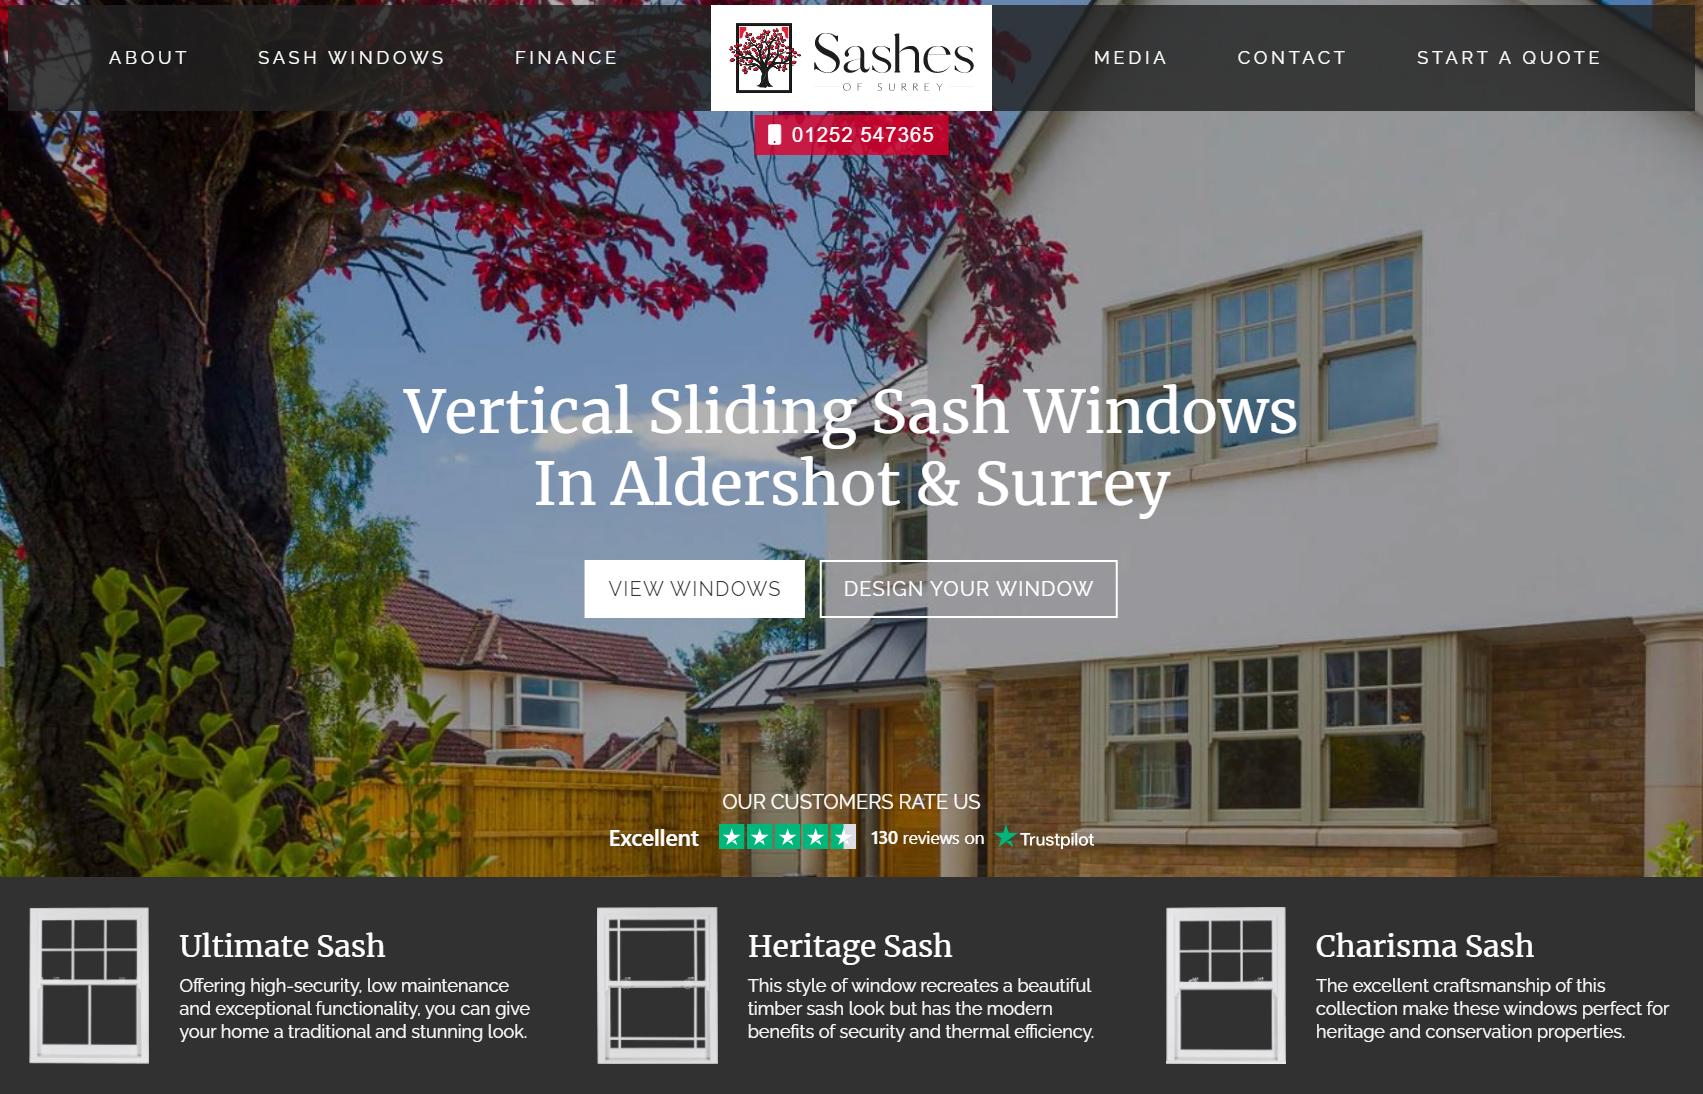 Sashes of Surrey